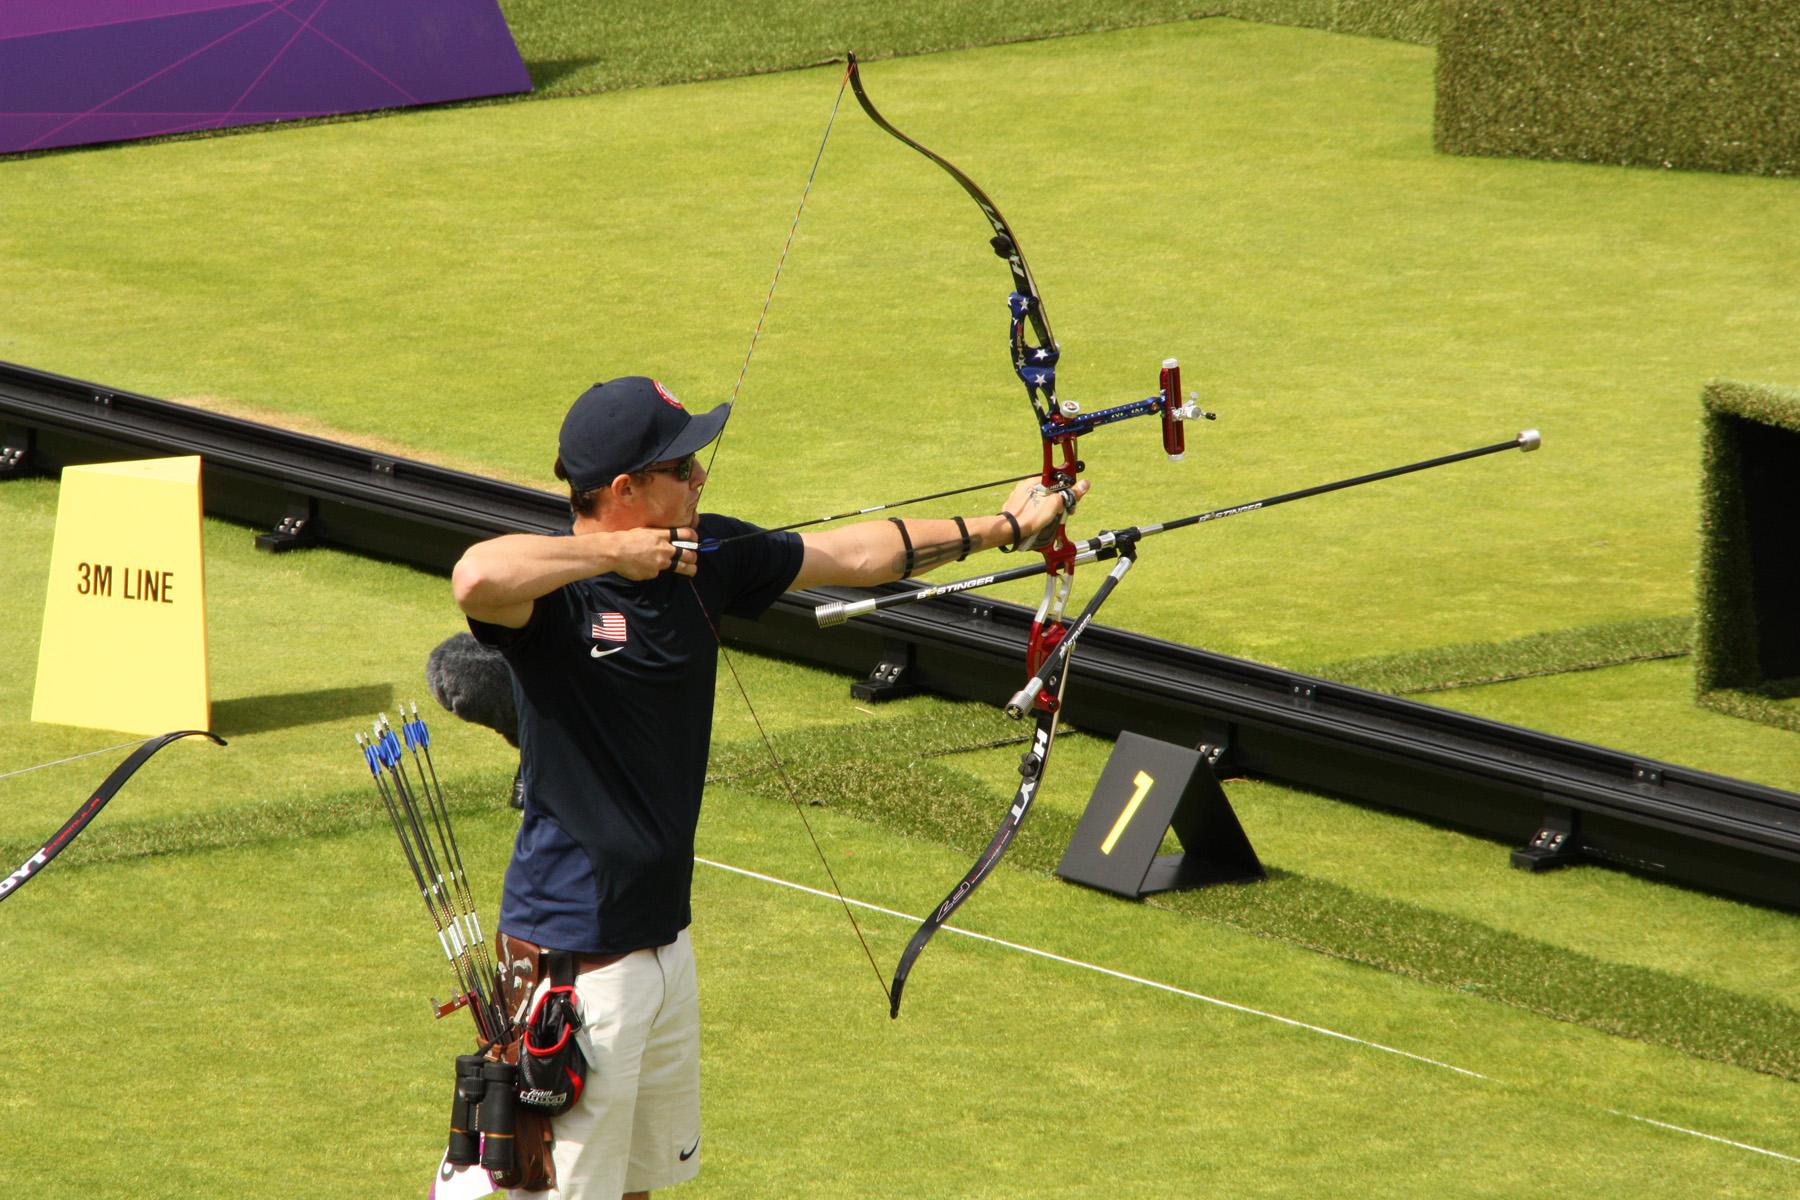 olympic archery equipment